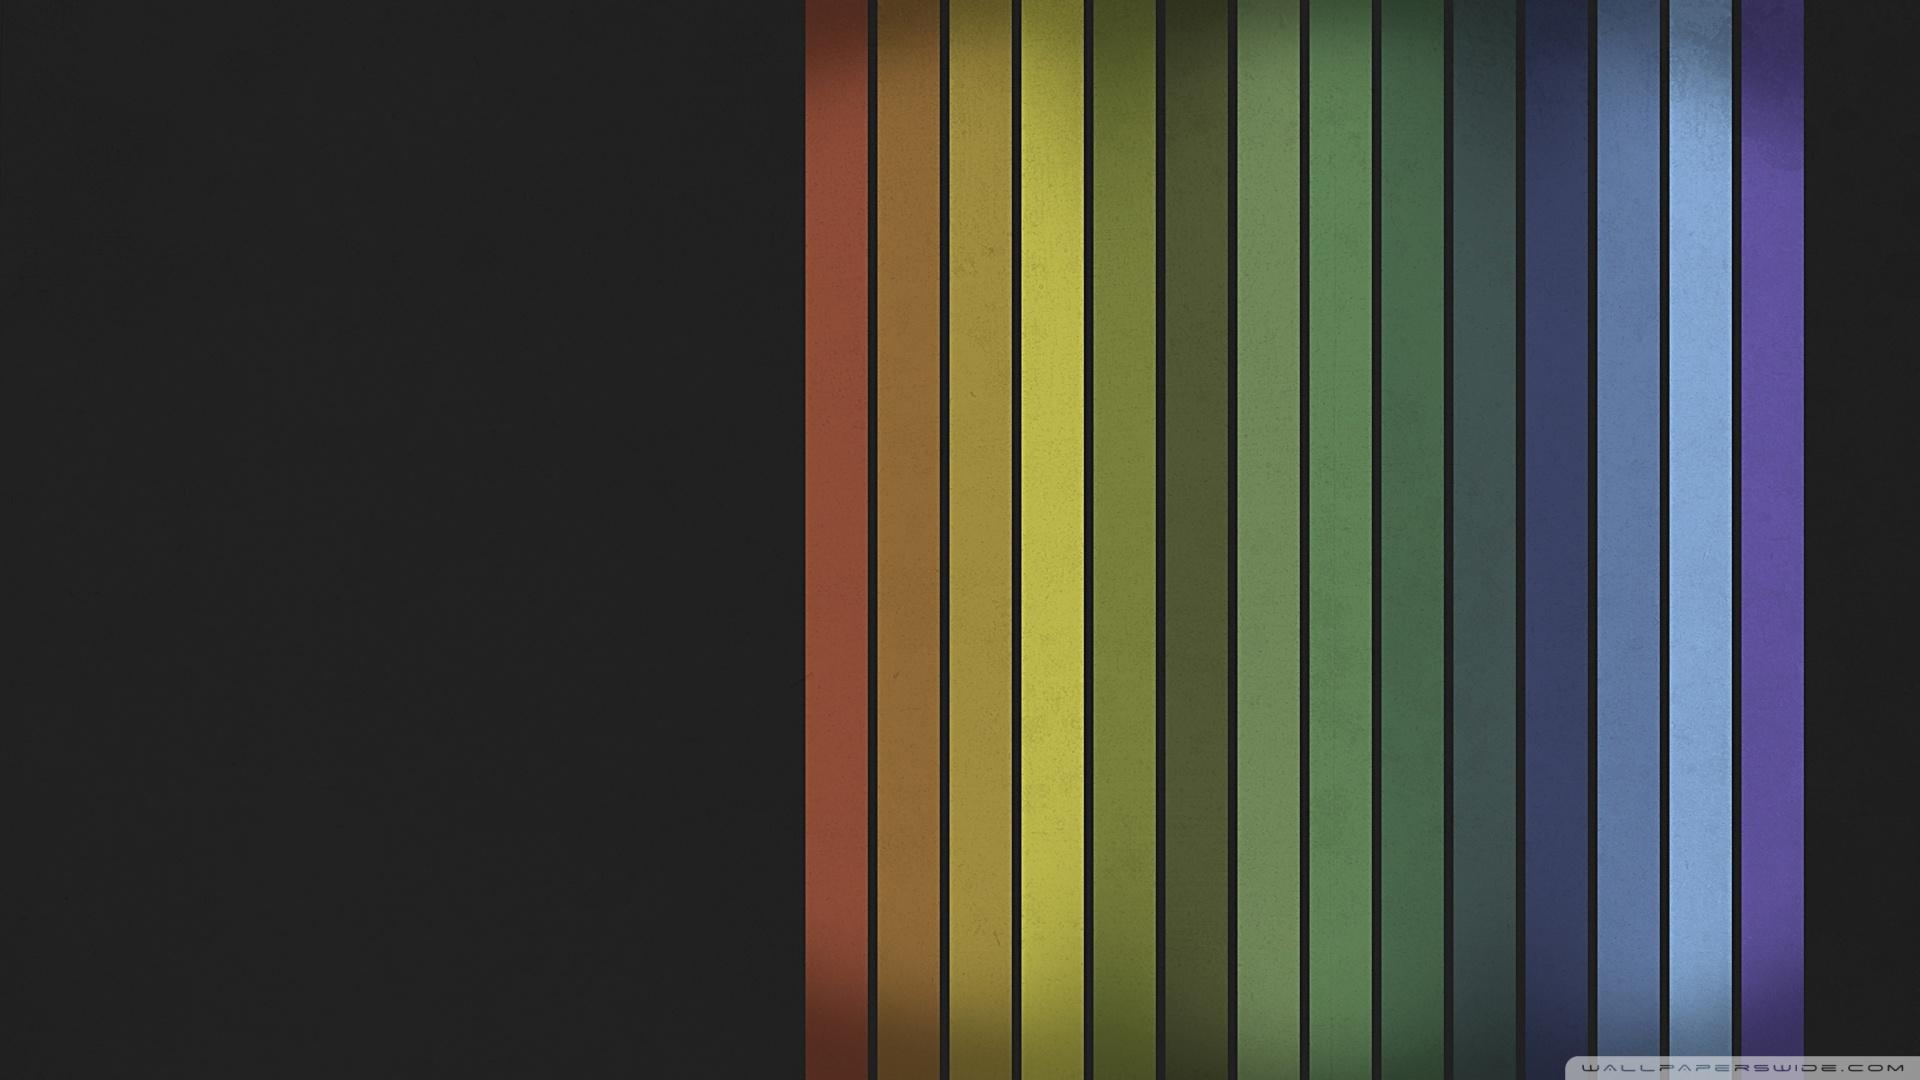 vintage stripes colorful wallpaper images 1920x1080 1920x1080